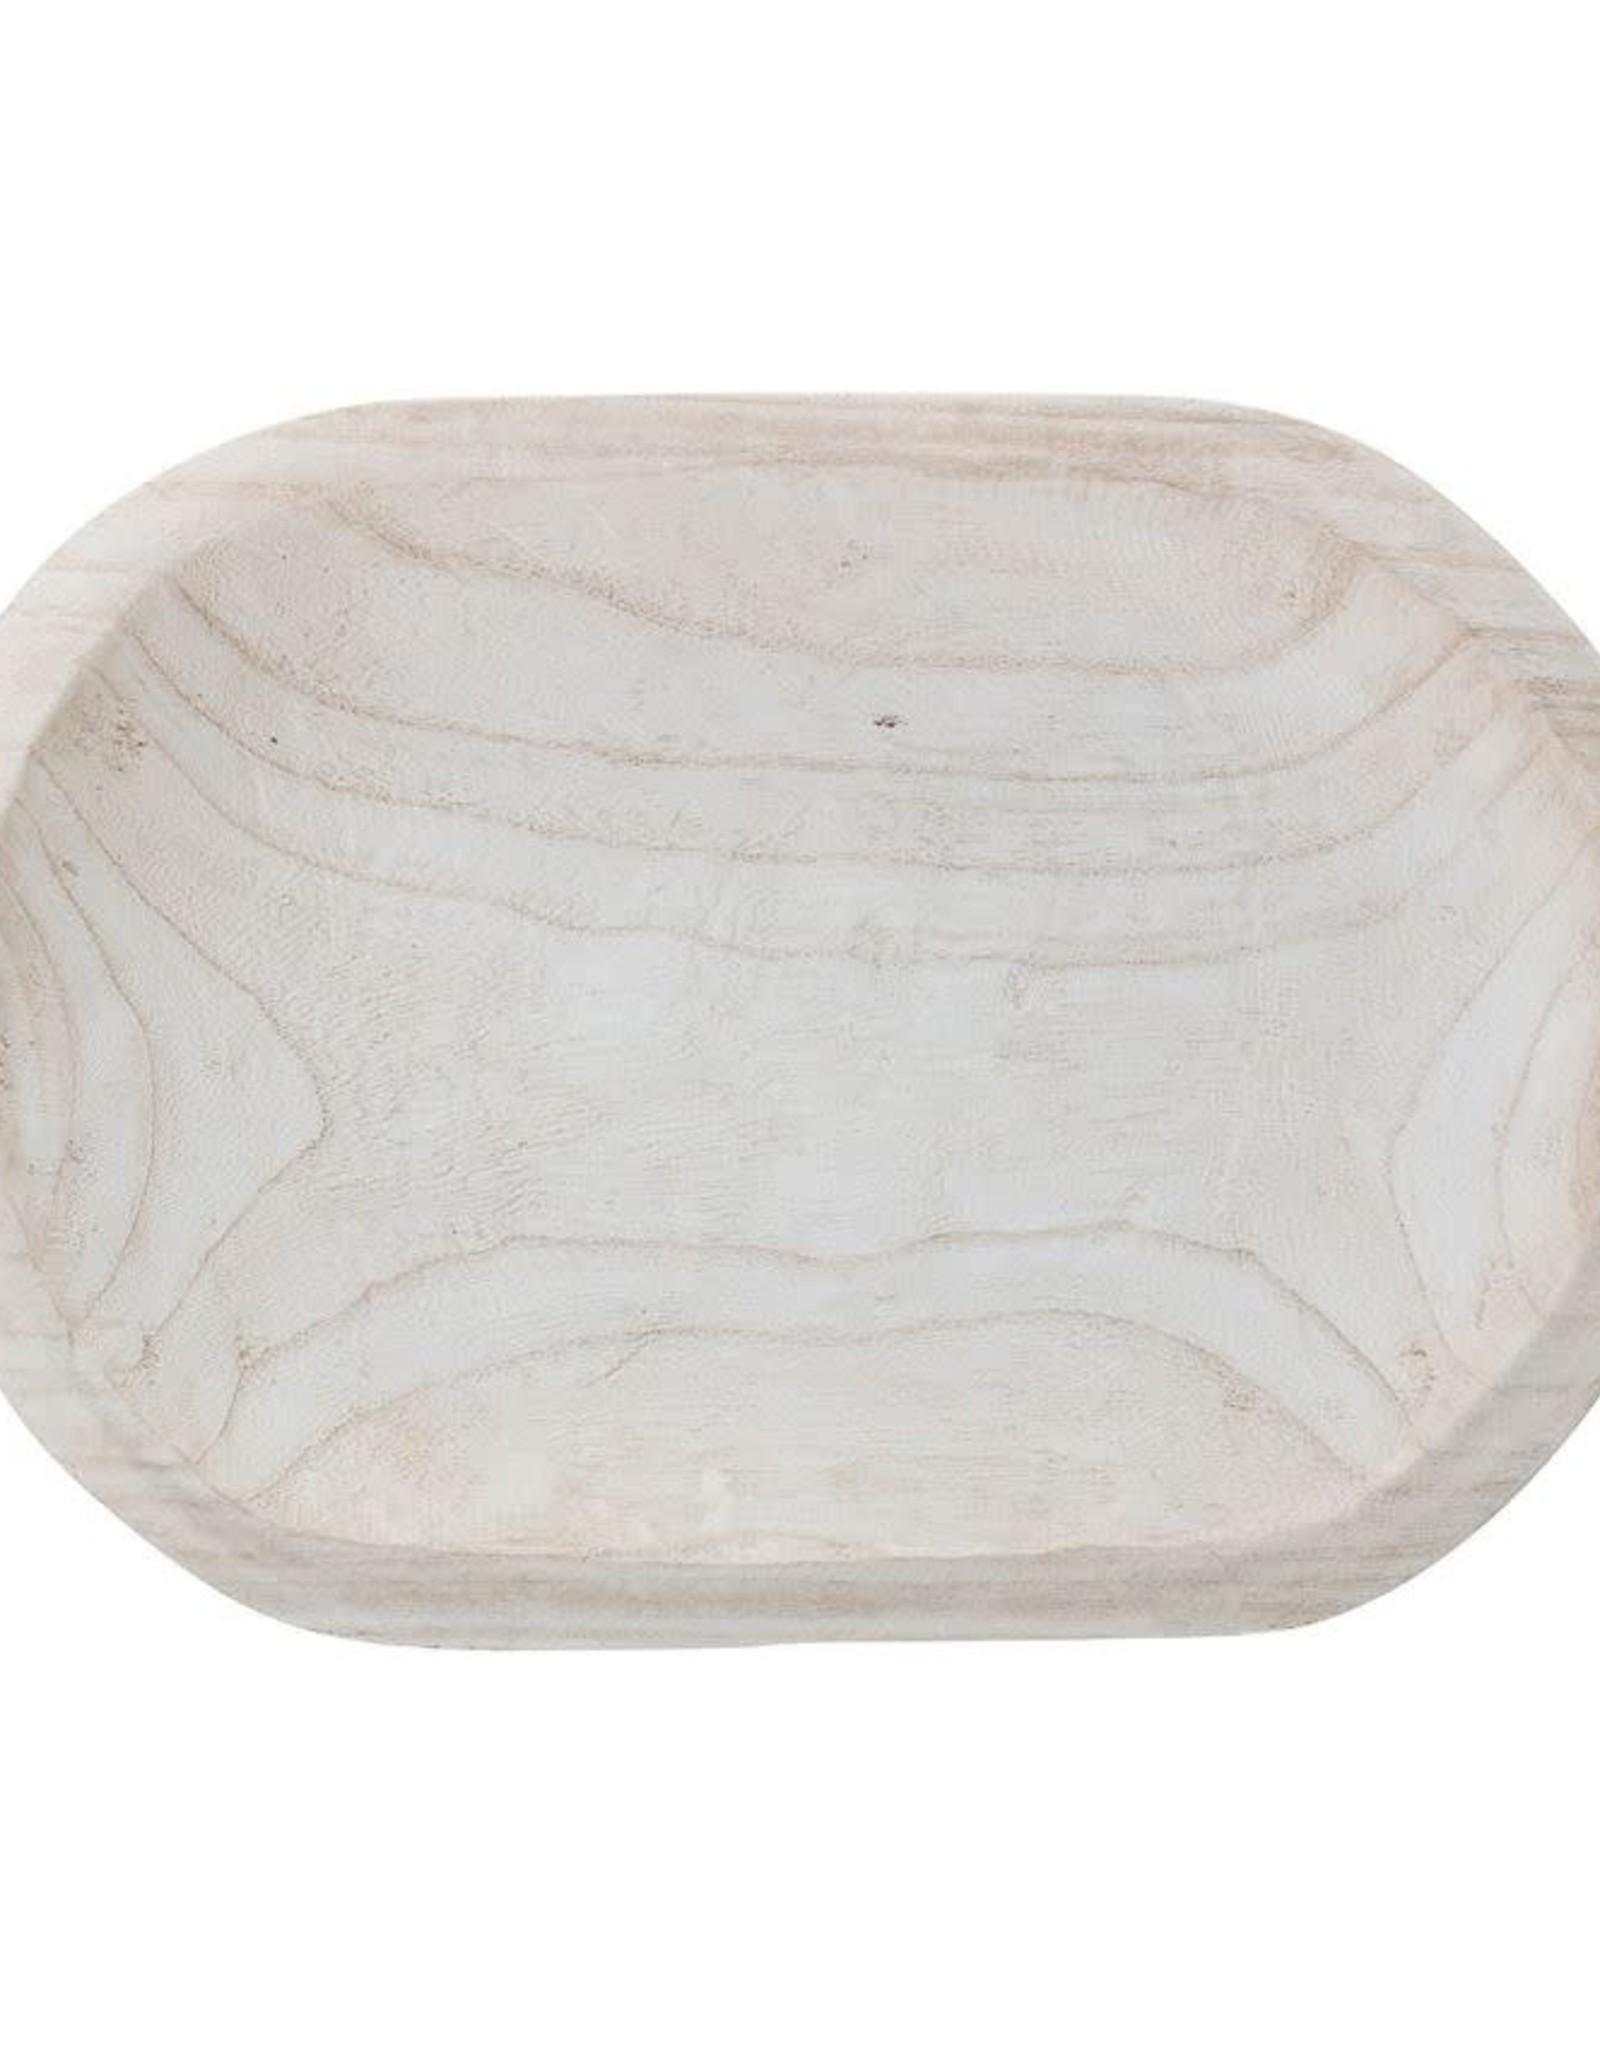 Decorative Hand-Carved Paulownia Wood Bowl - Whitewashed